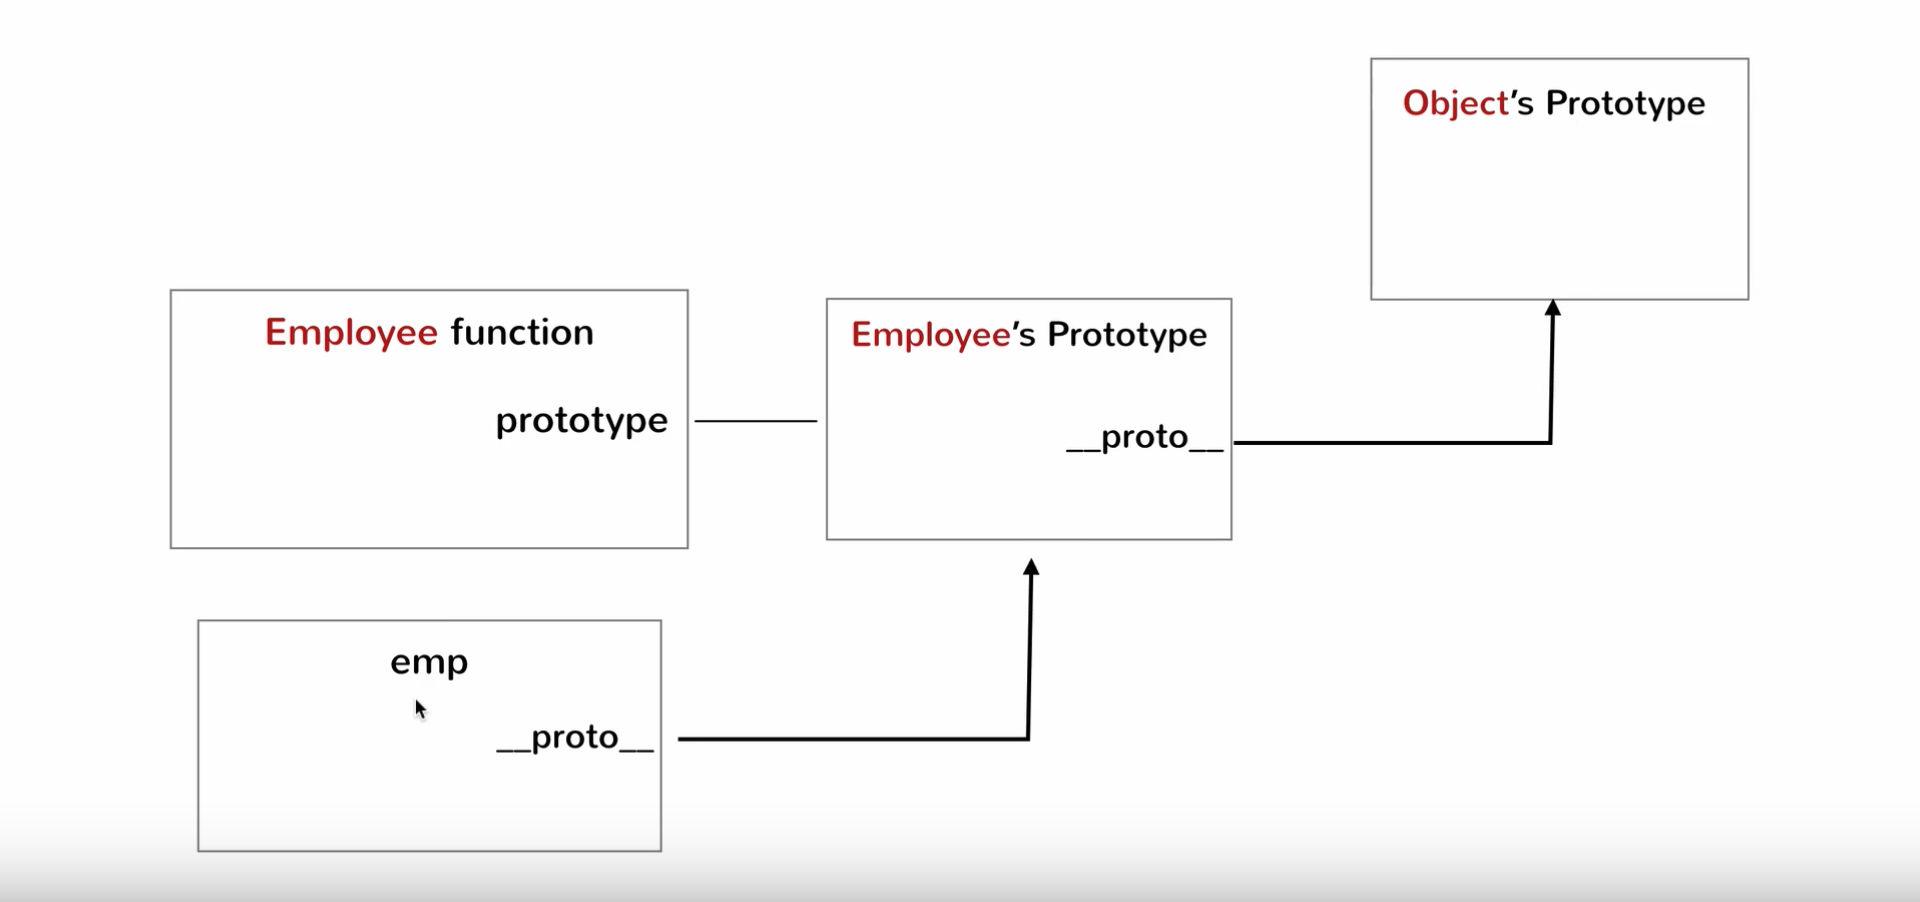 The Prototype Object